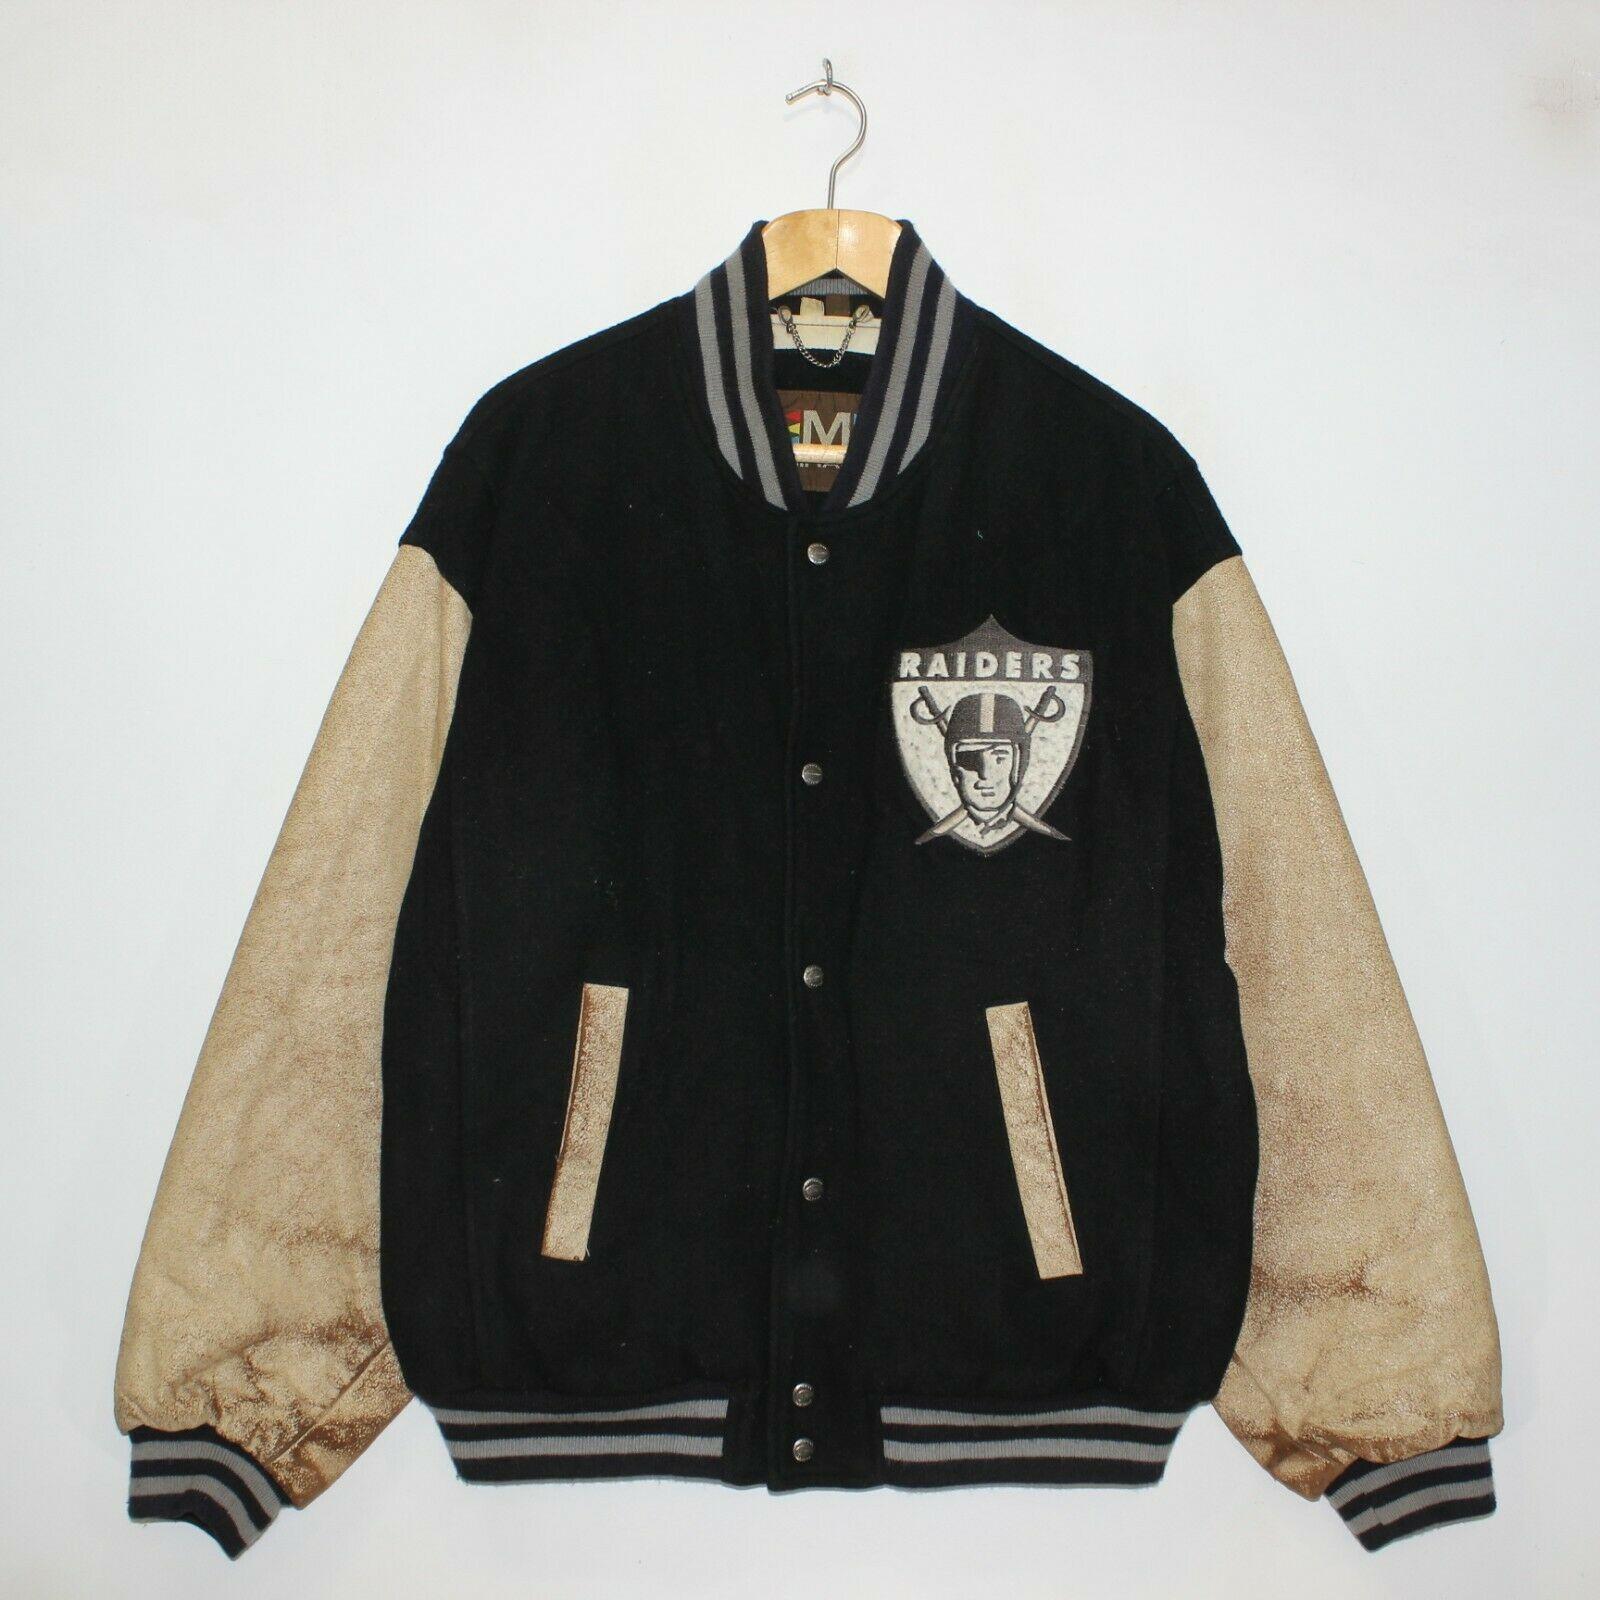 Vintage Oakland Raiders 1967 Mirage Nfl Wool Leather Varsity Jacket Size Large Ebay In 2020 Leather Varsity Jackets Varsity Jacket Jackets